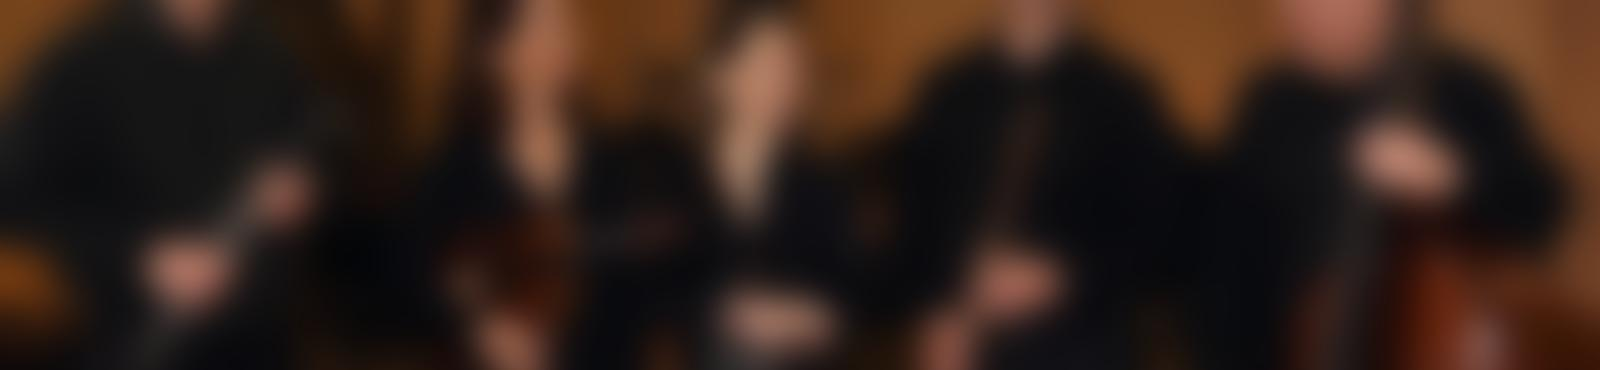 Blurred 6058c70b 5000 45f6 85d0 a1f2e542800c